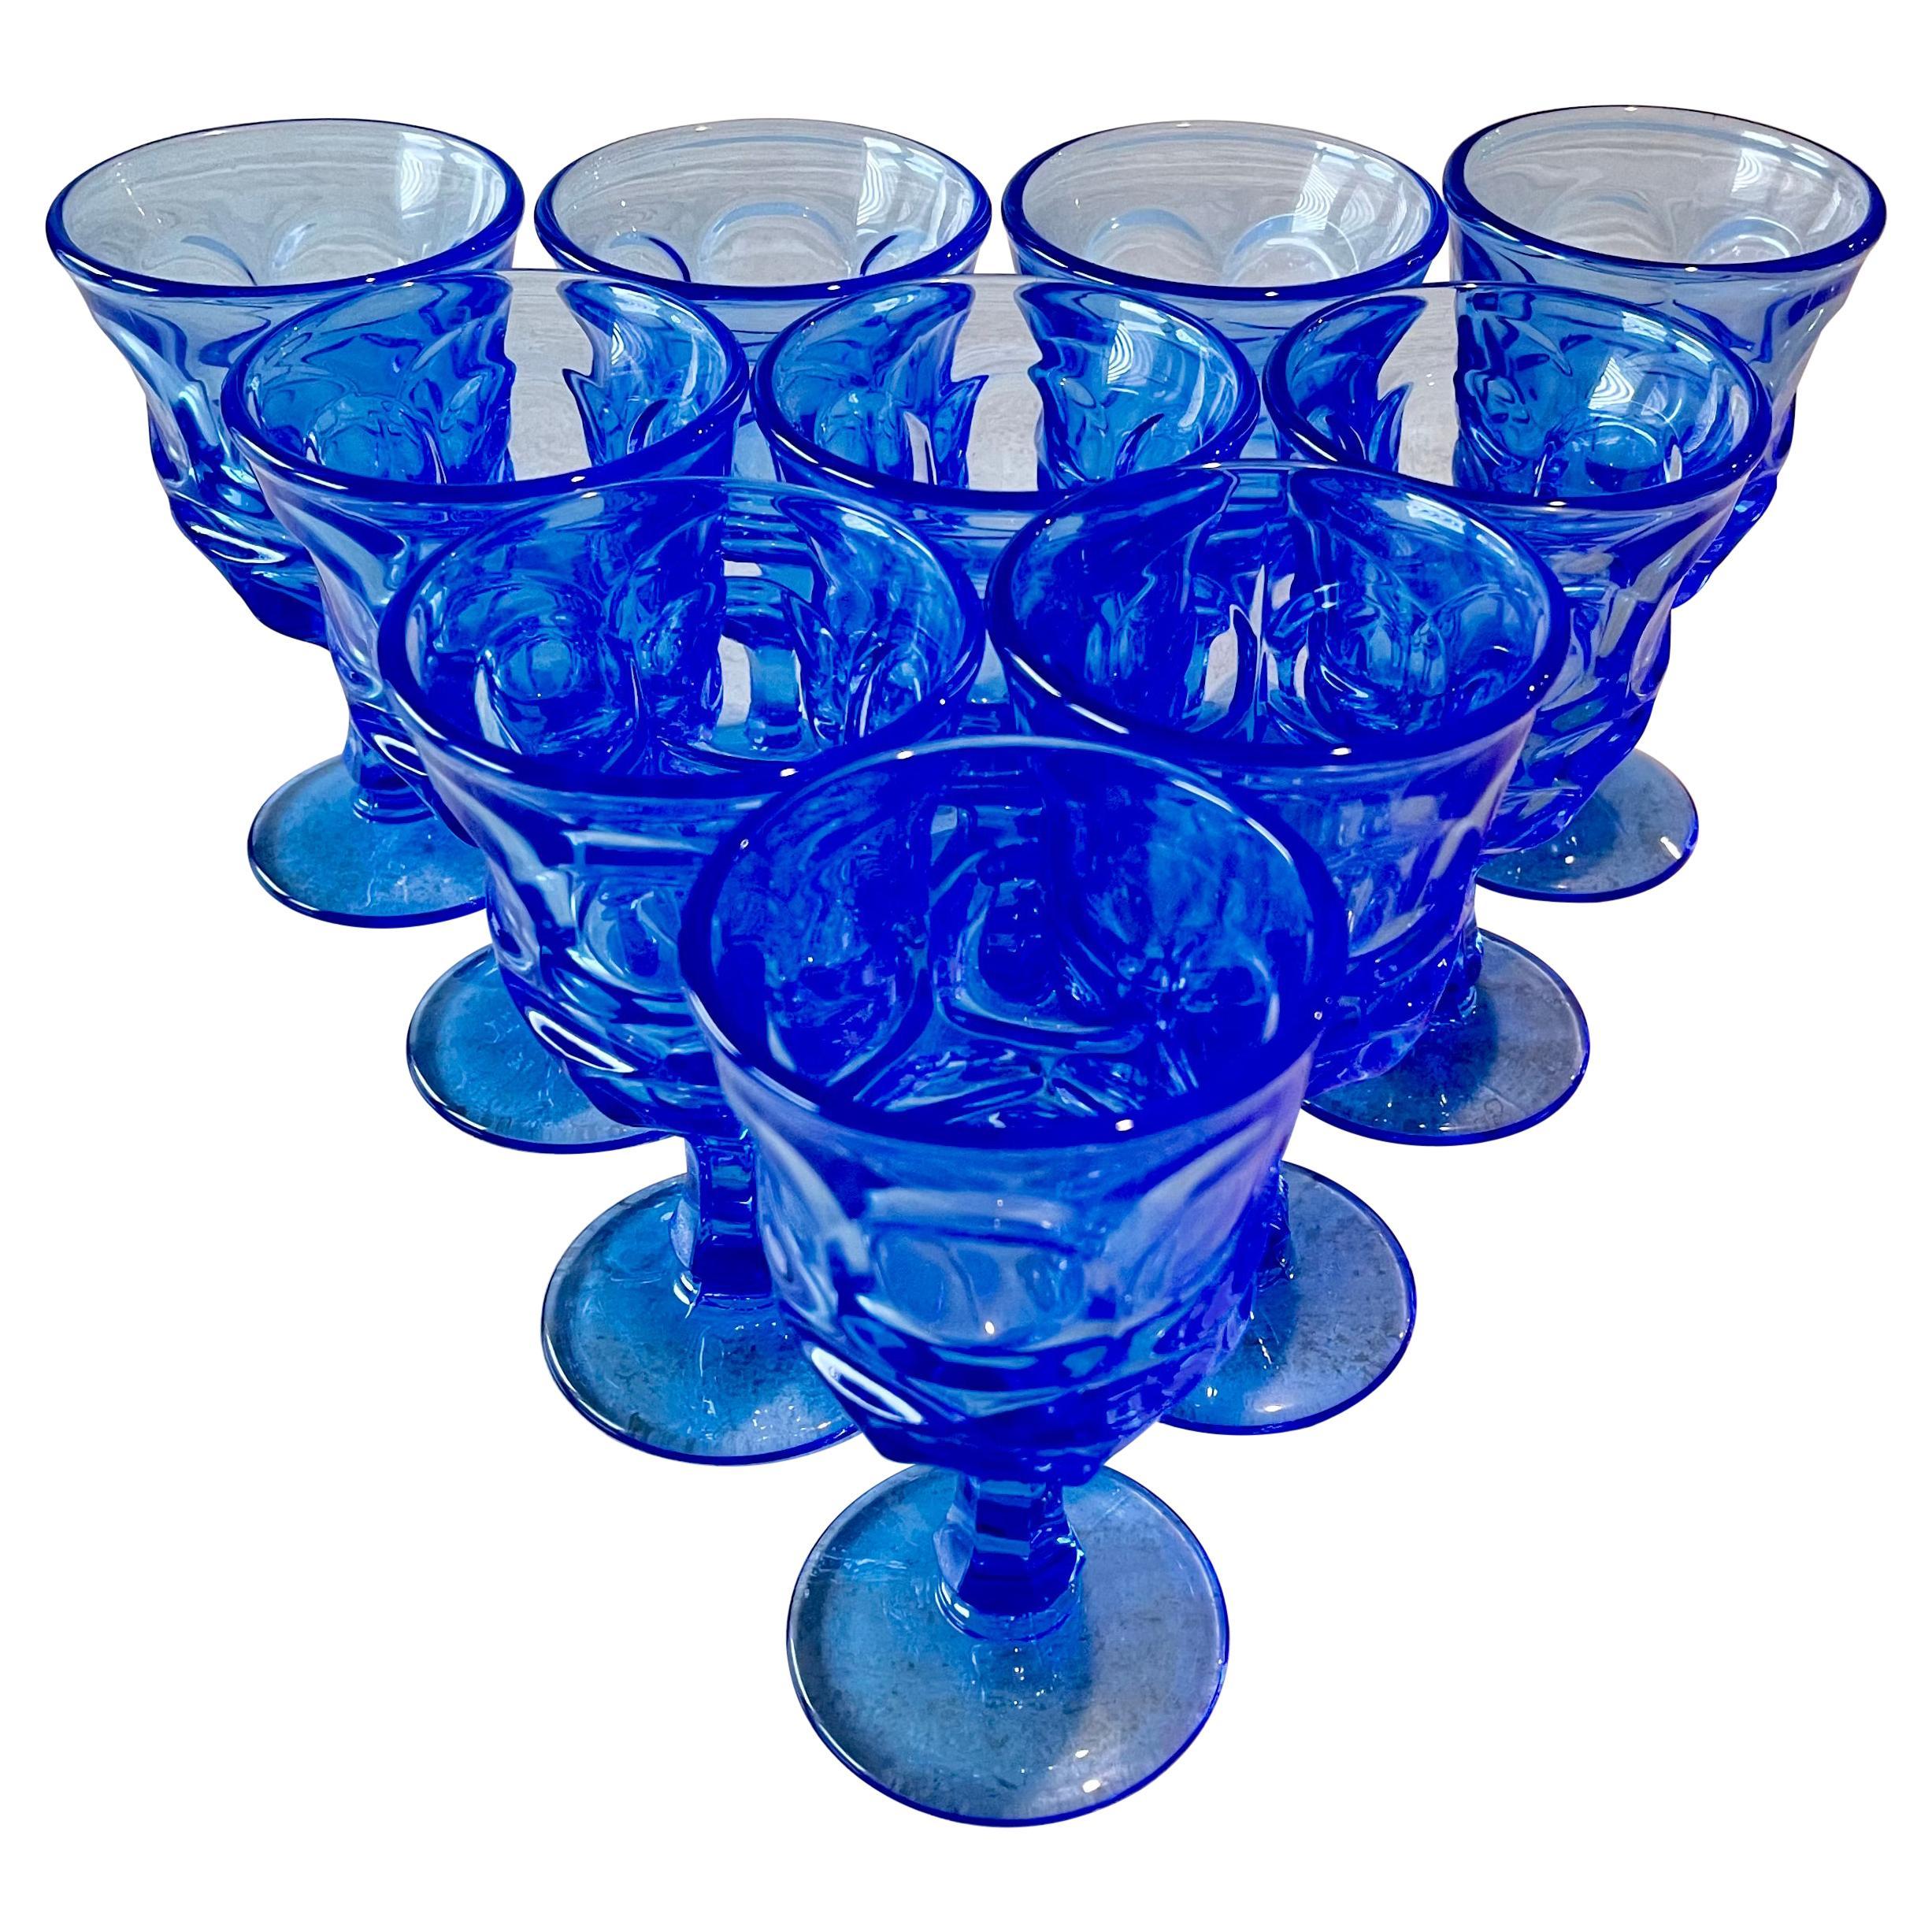 Blue Fostoria Cordial Glasses